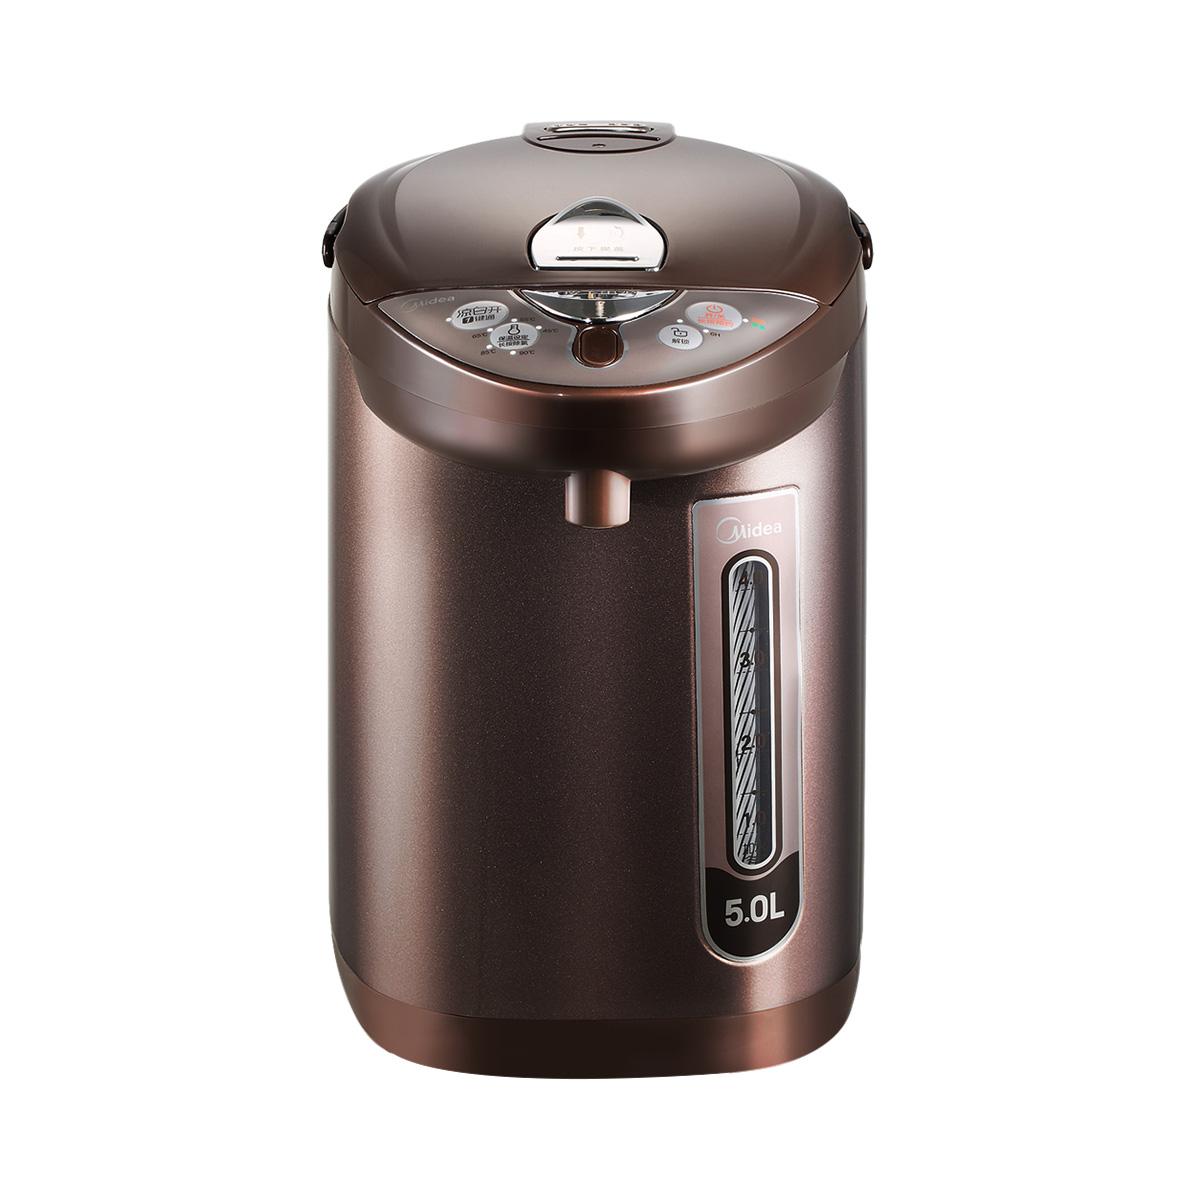 Midea/美的 PF703-50T(PF703-50T)电热水瓶 说明书.pdf